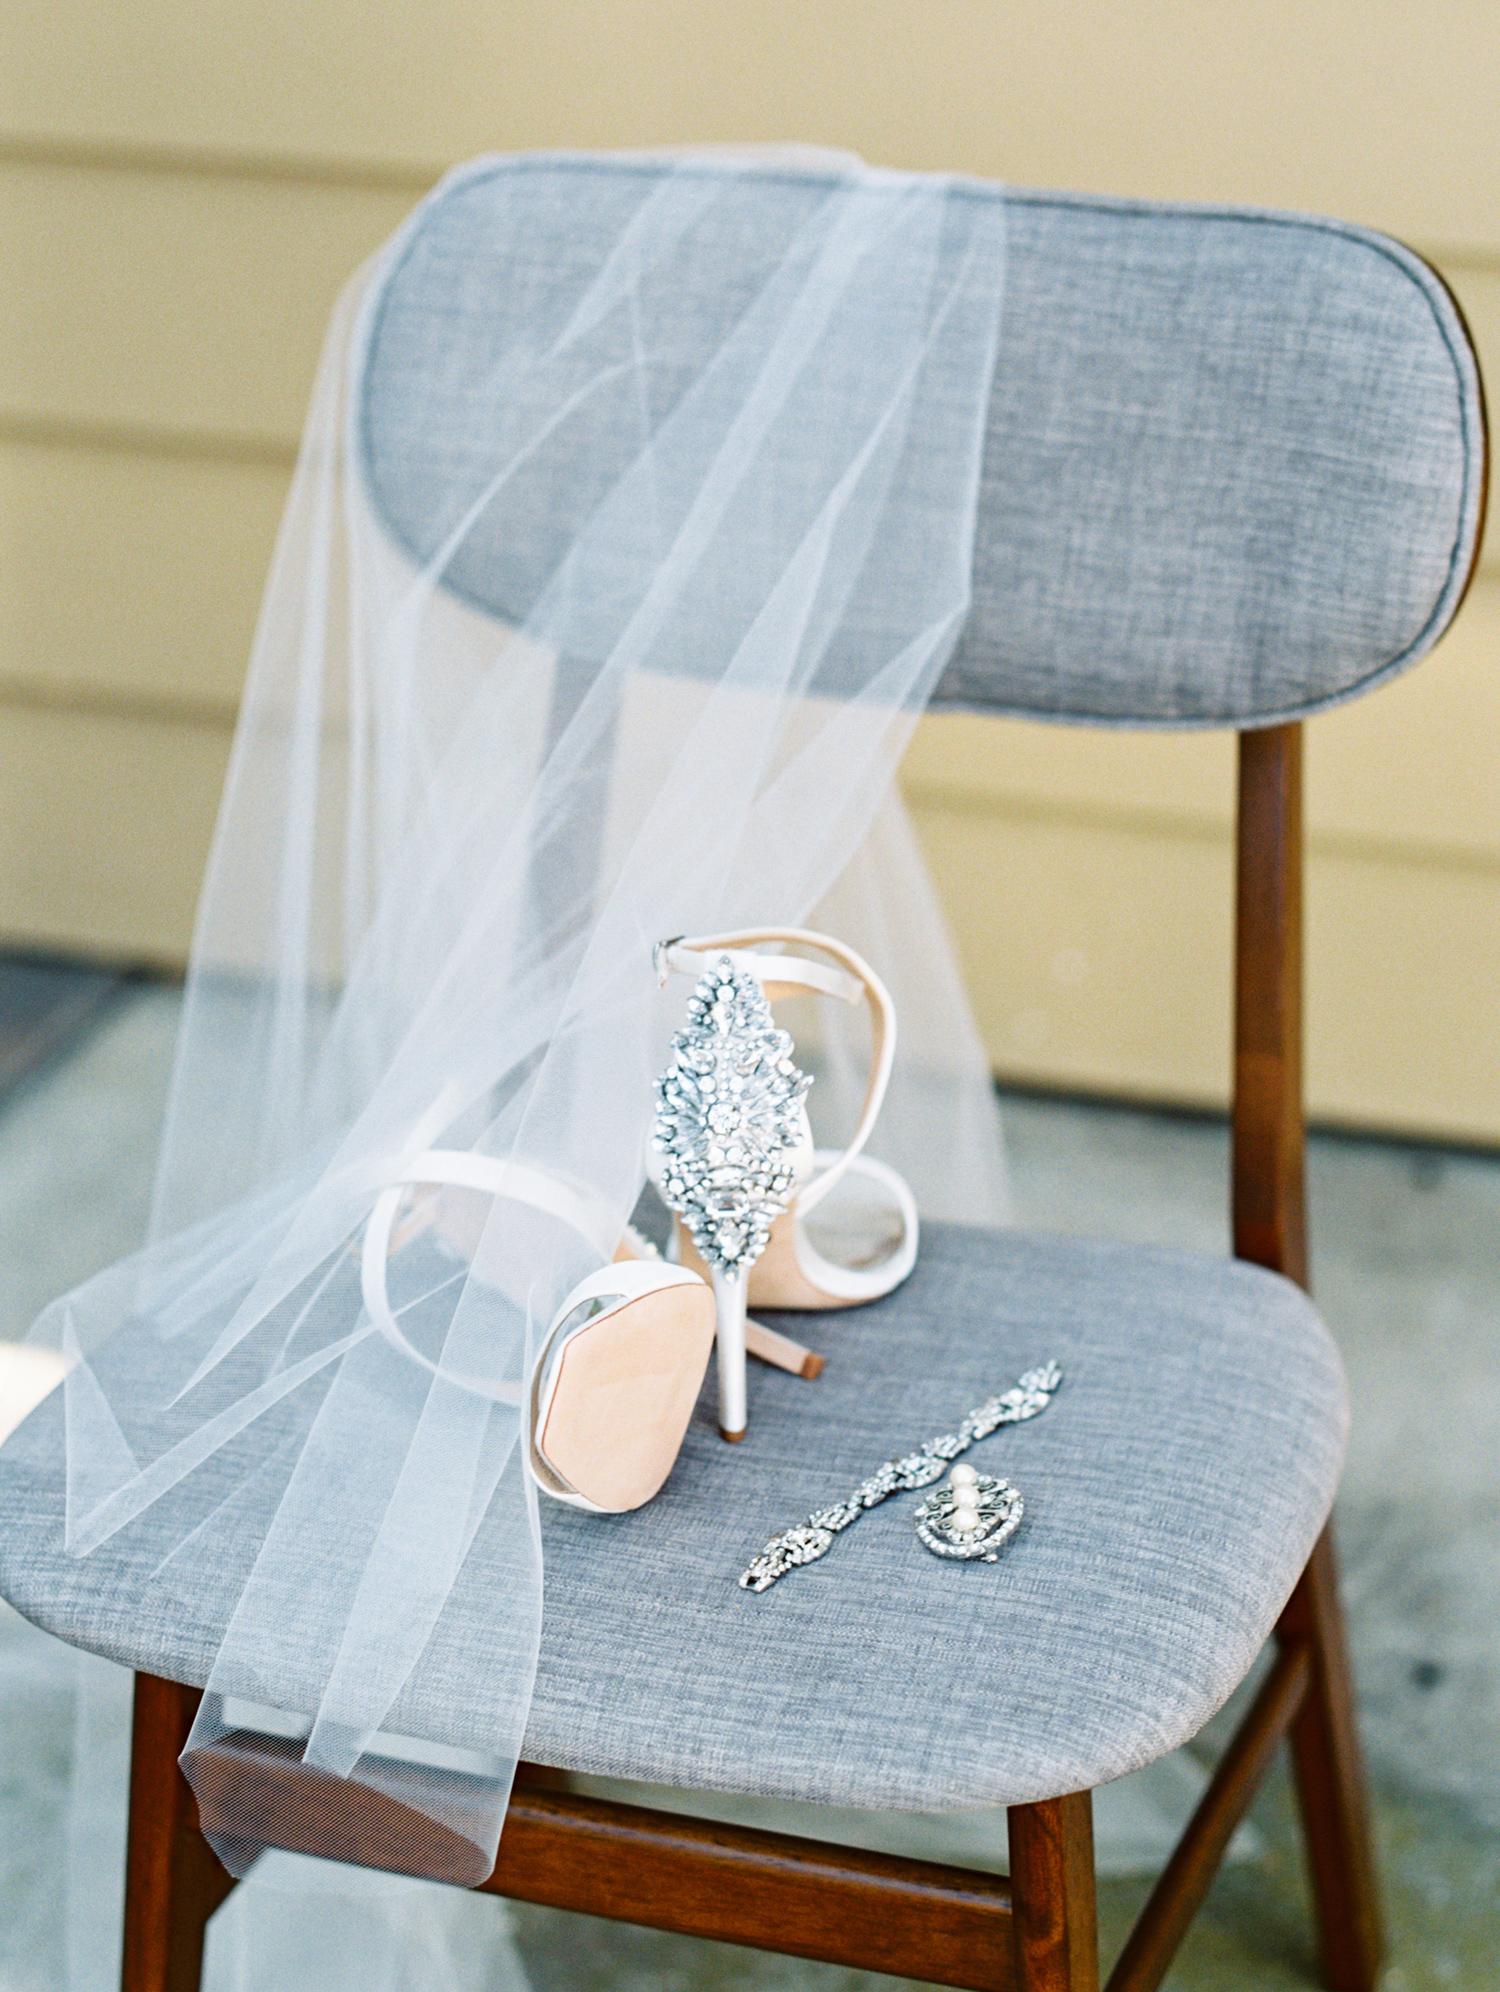 047-Jen-Wojcik-Photography-San-Diego-Wedding-Photographer.jpg